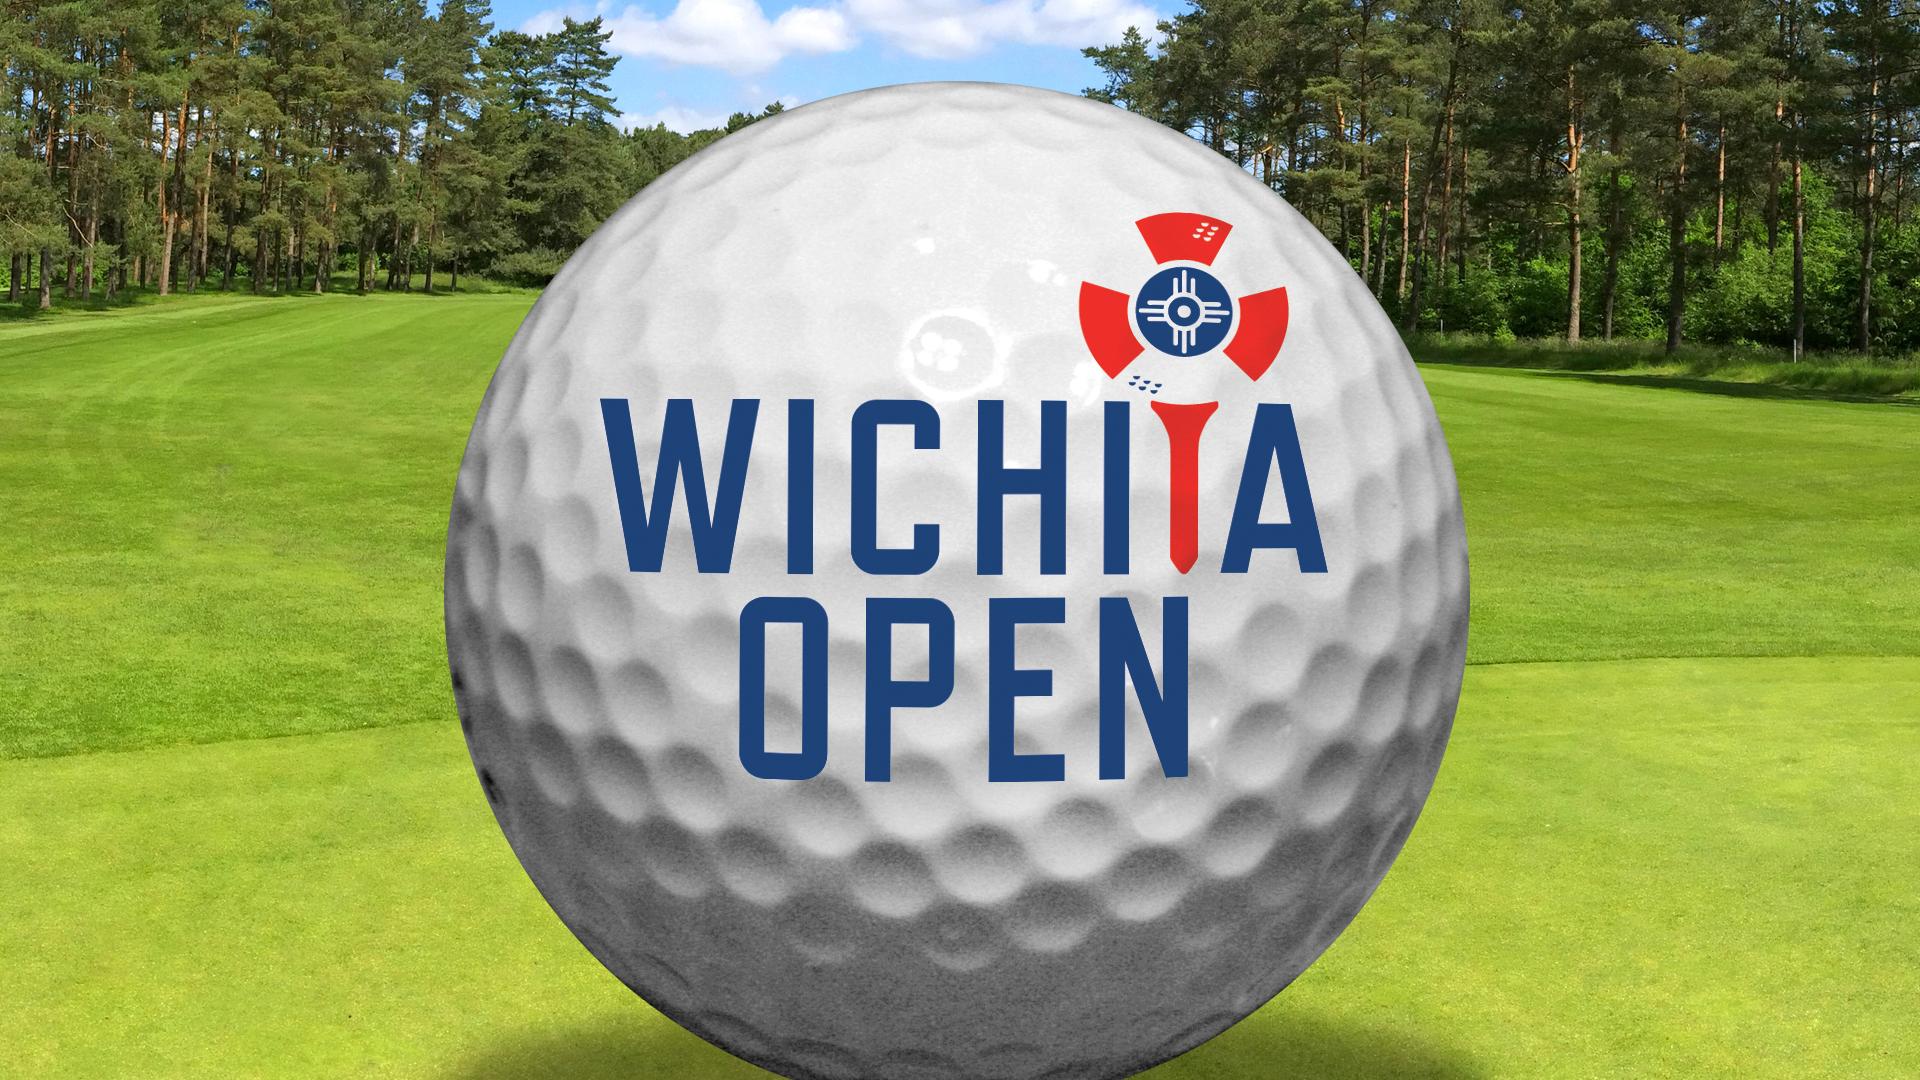 TRIPS Wichita Open Golf_1529787410682.jpg.jpg